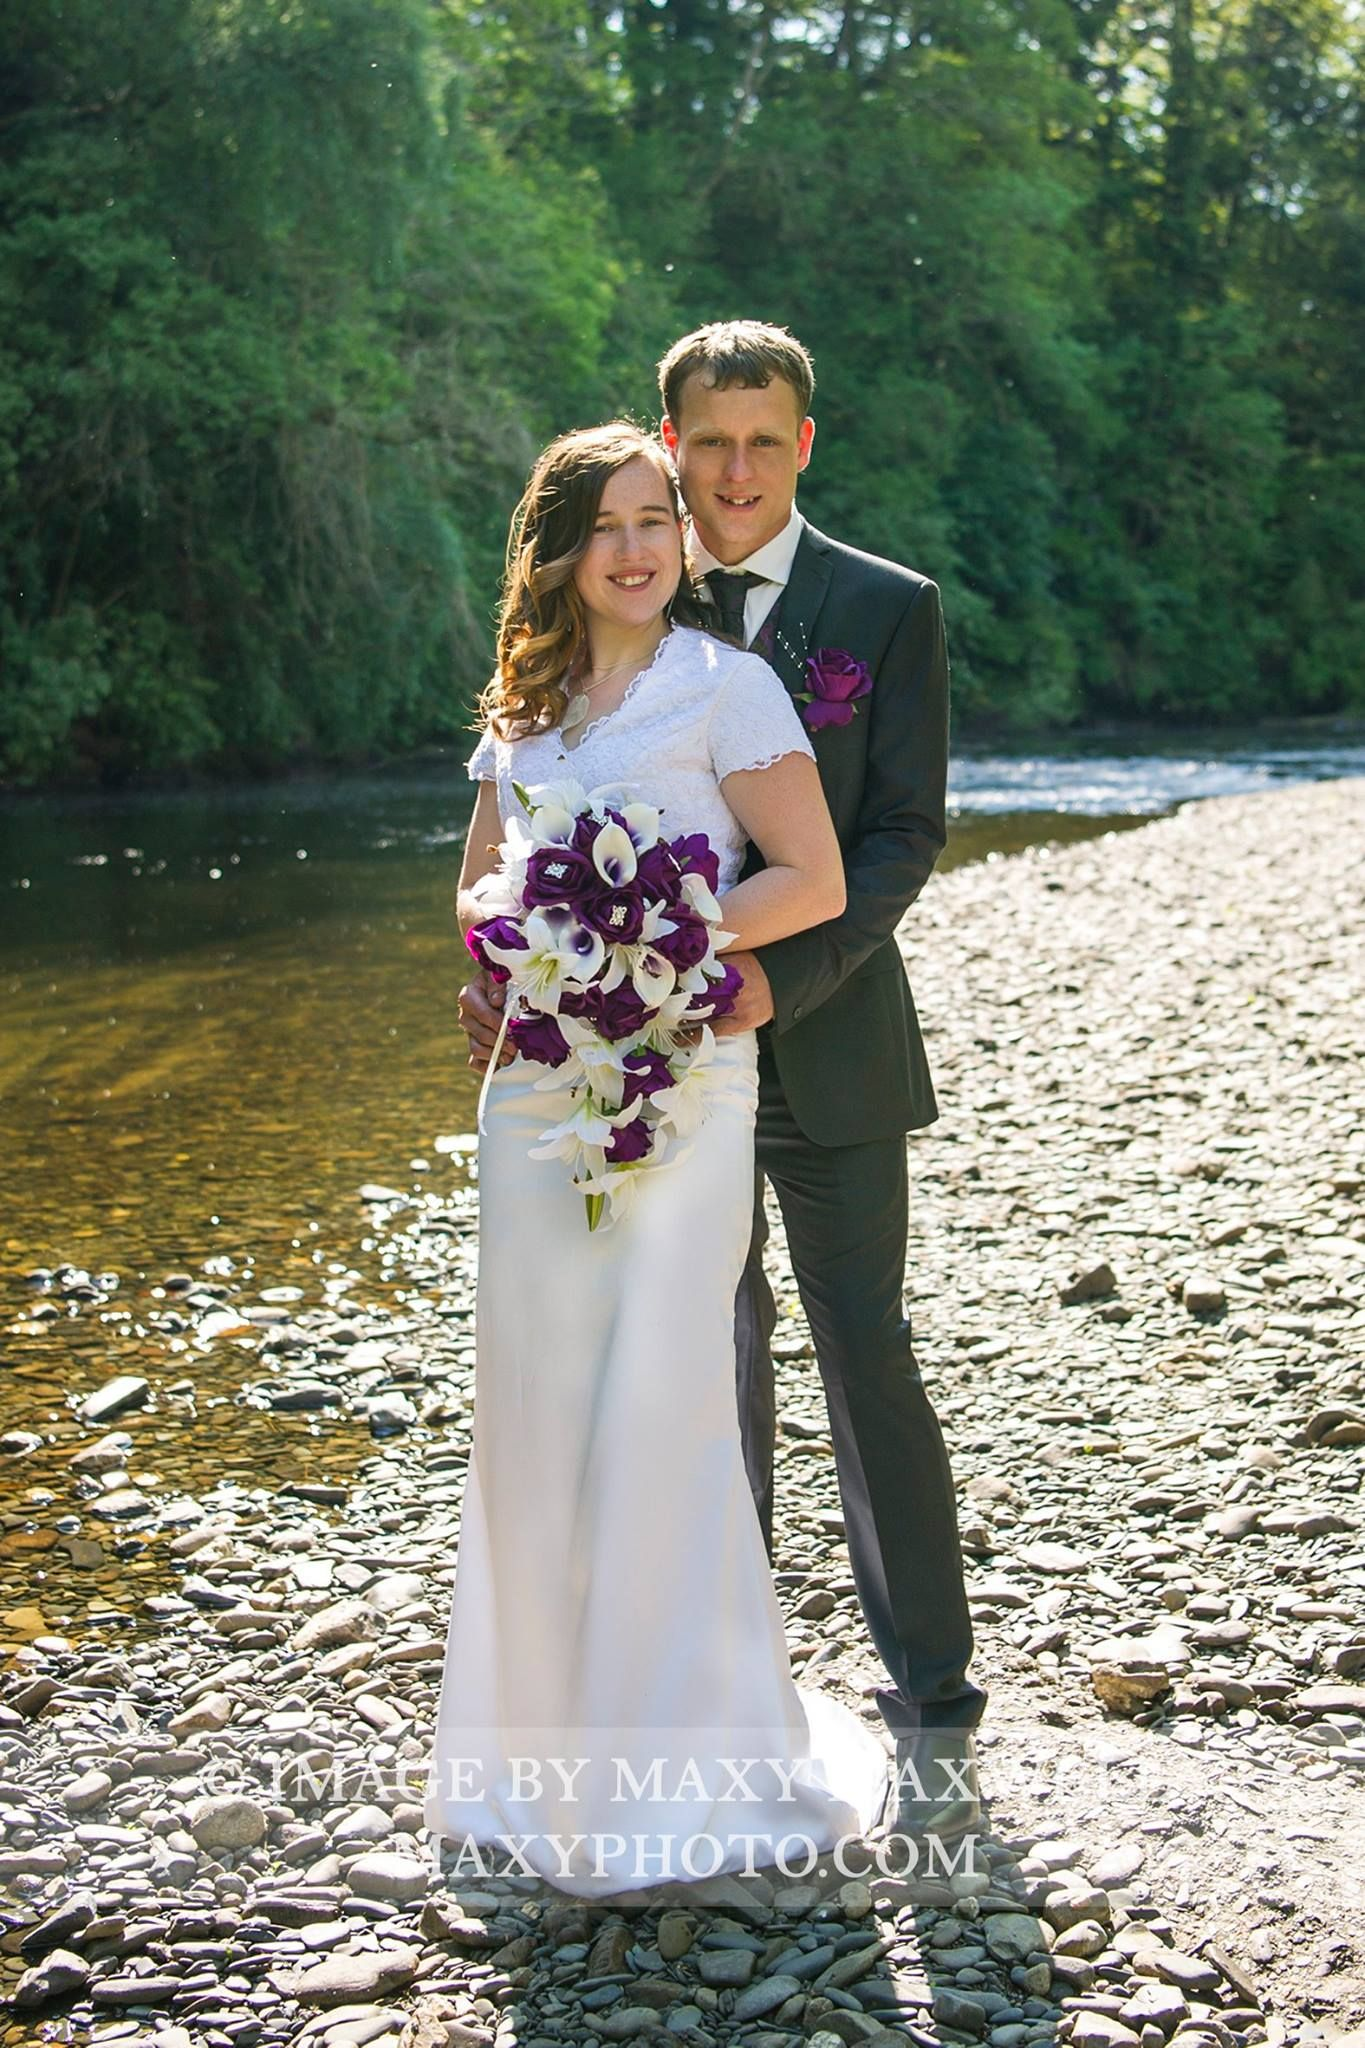 Amy and john enjoyed their summer wedding in wales at caer beris